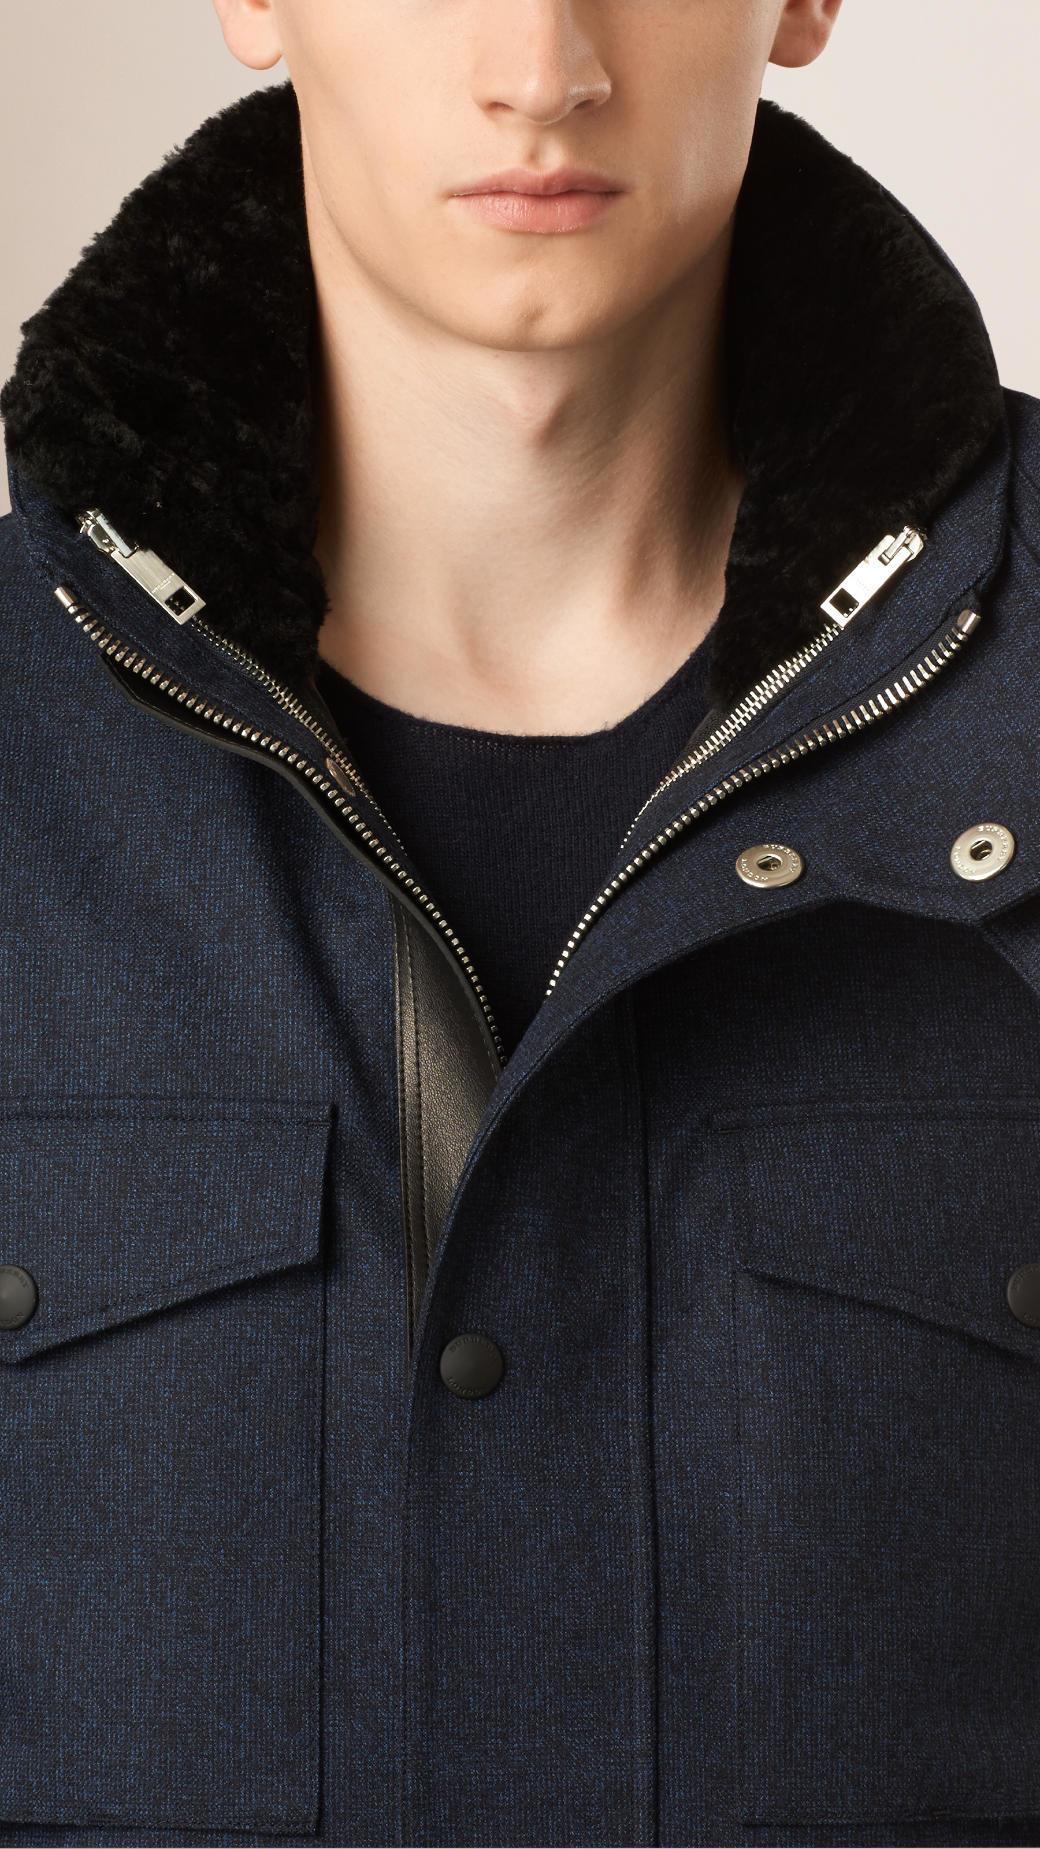 Burberry Cropped Wool Field Jacket in Blue for Men